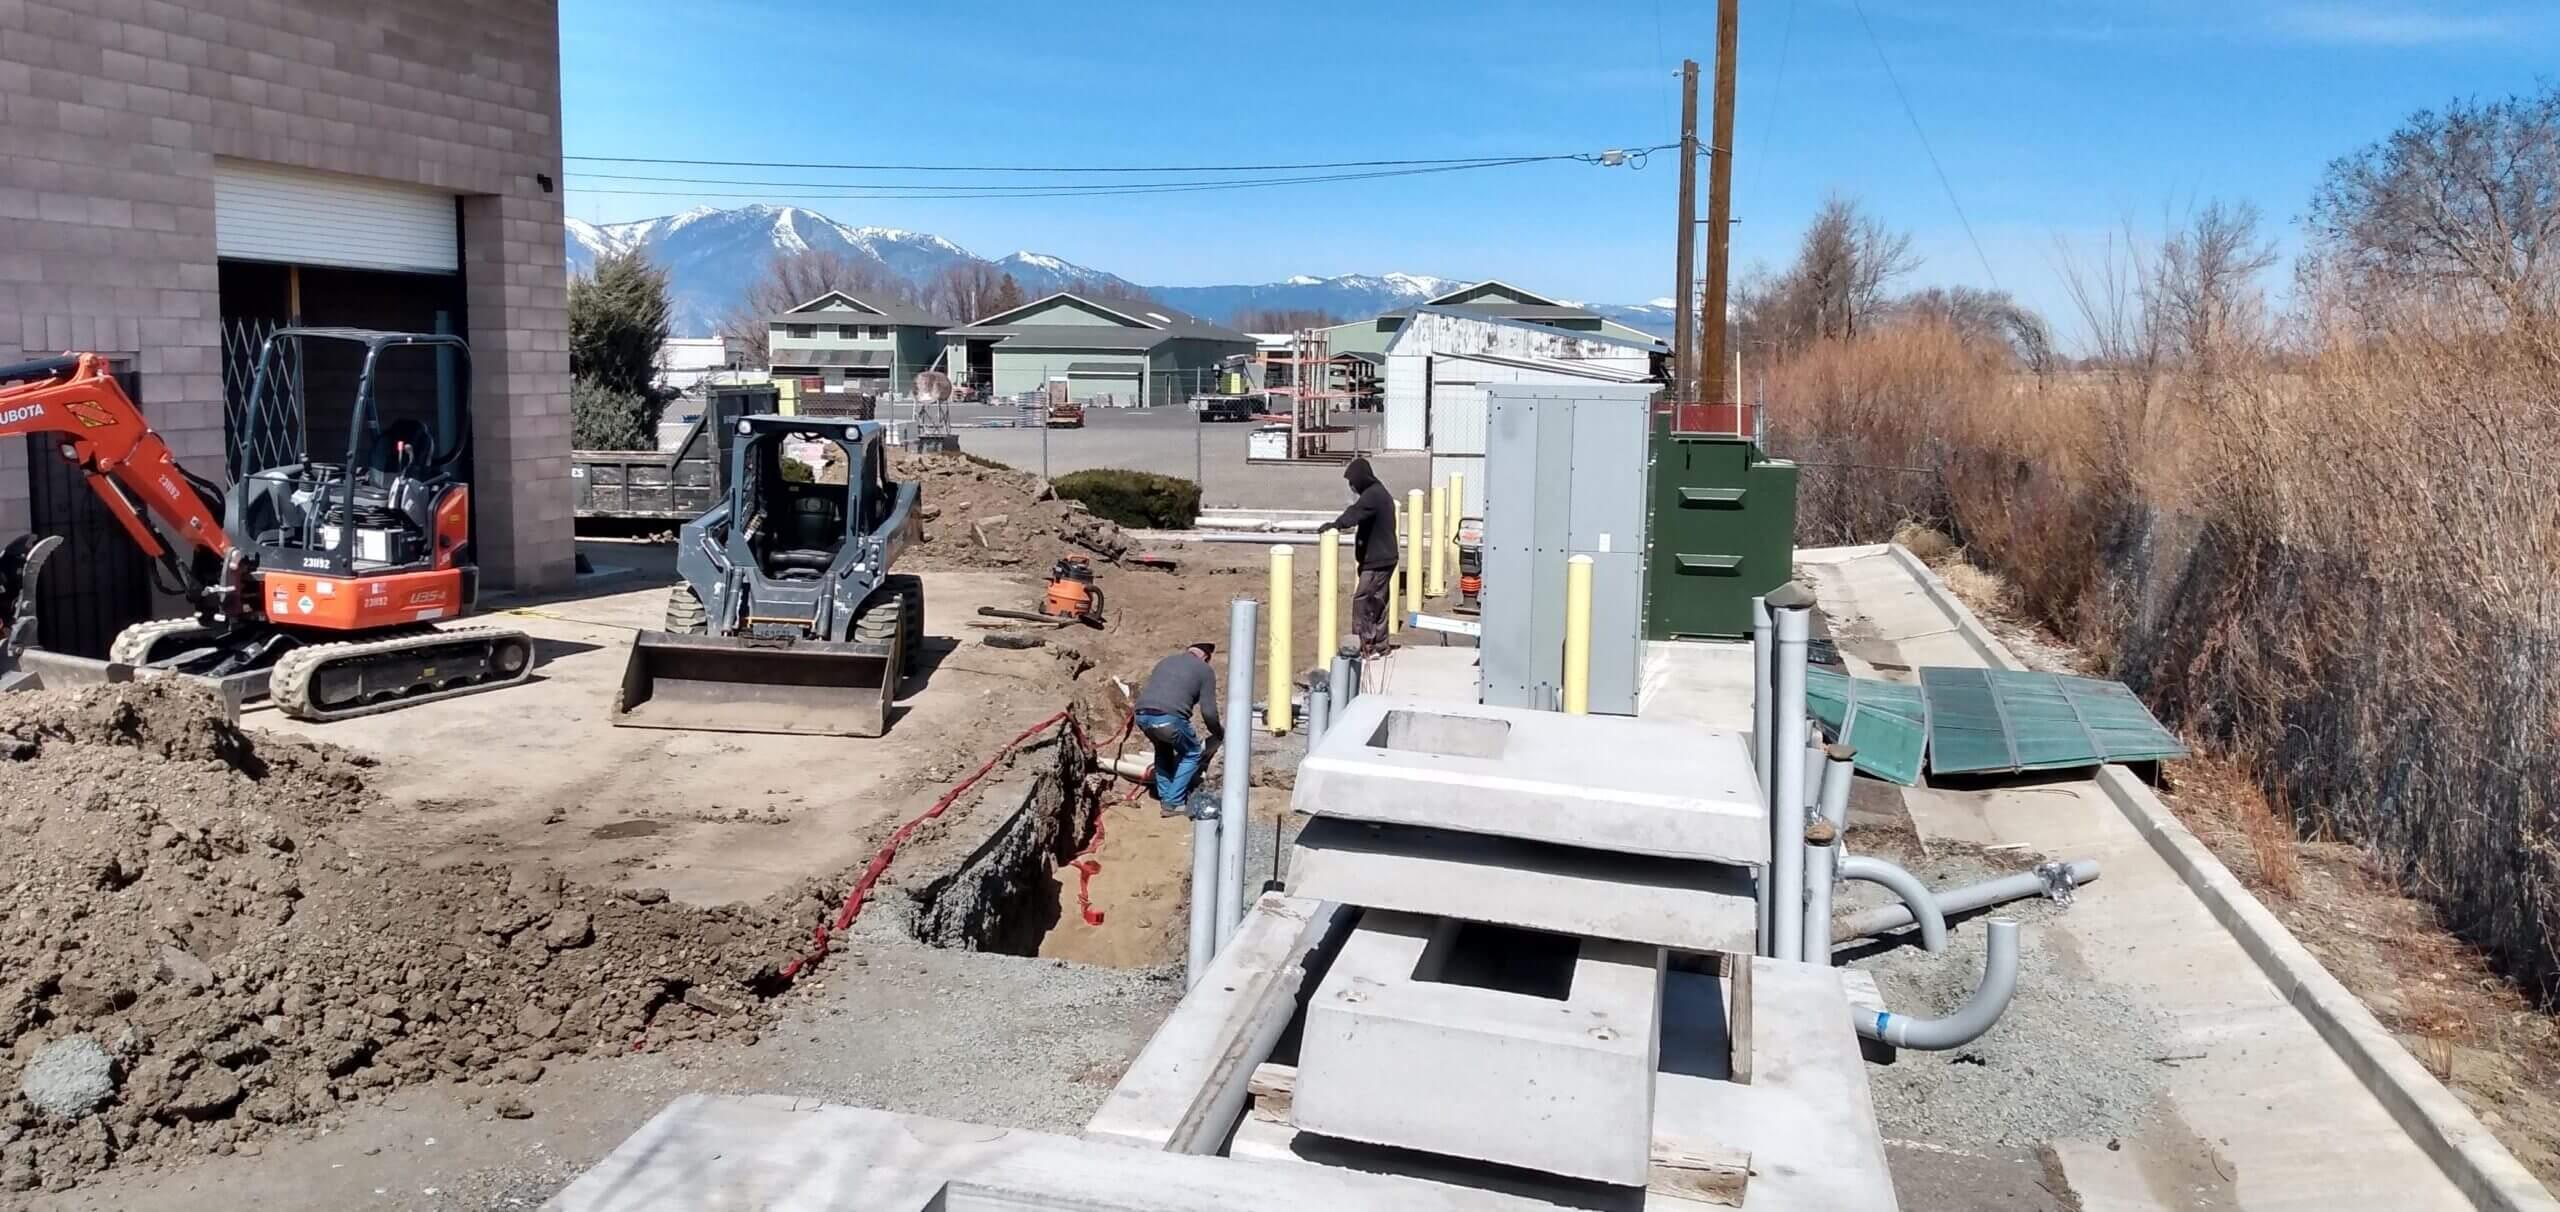 TeslaWatt Nevada expansion 4 MW